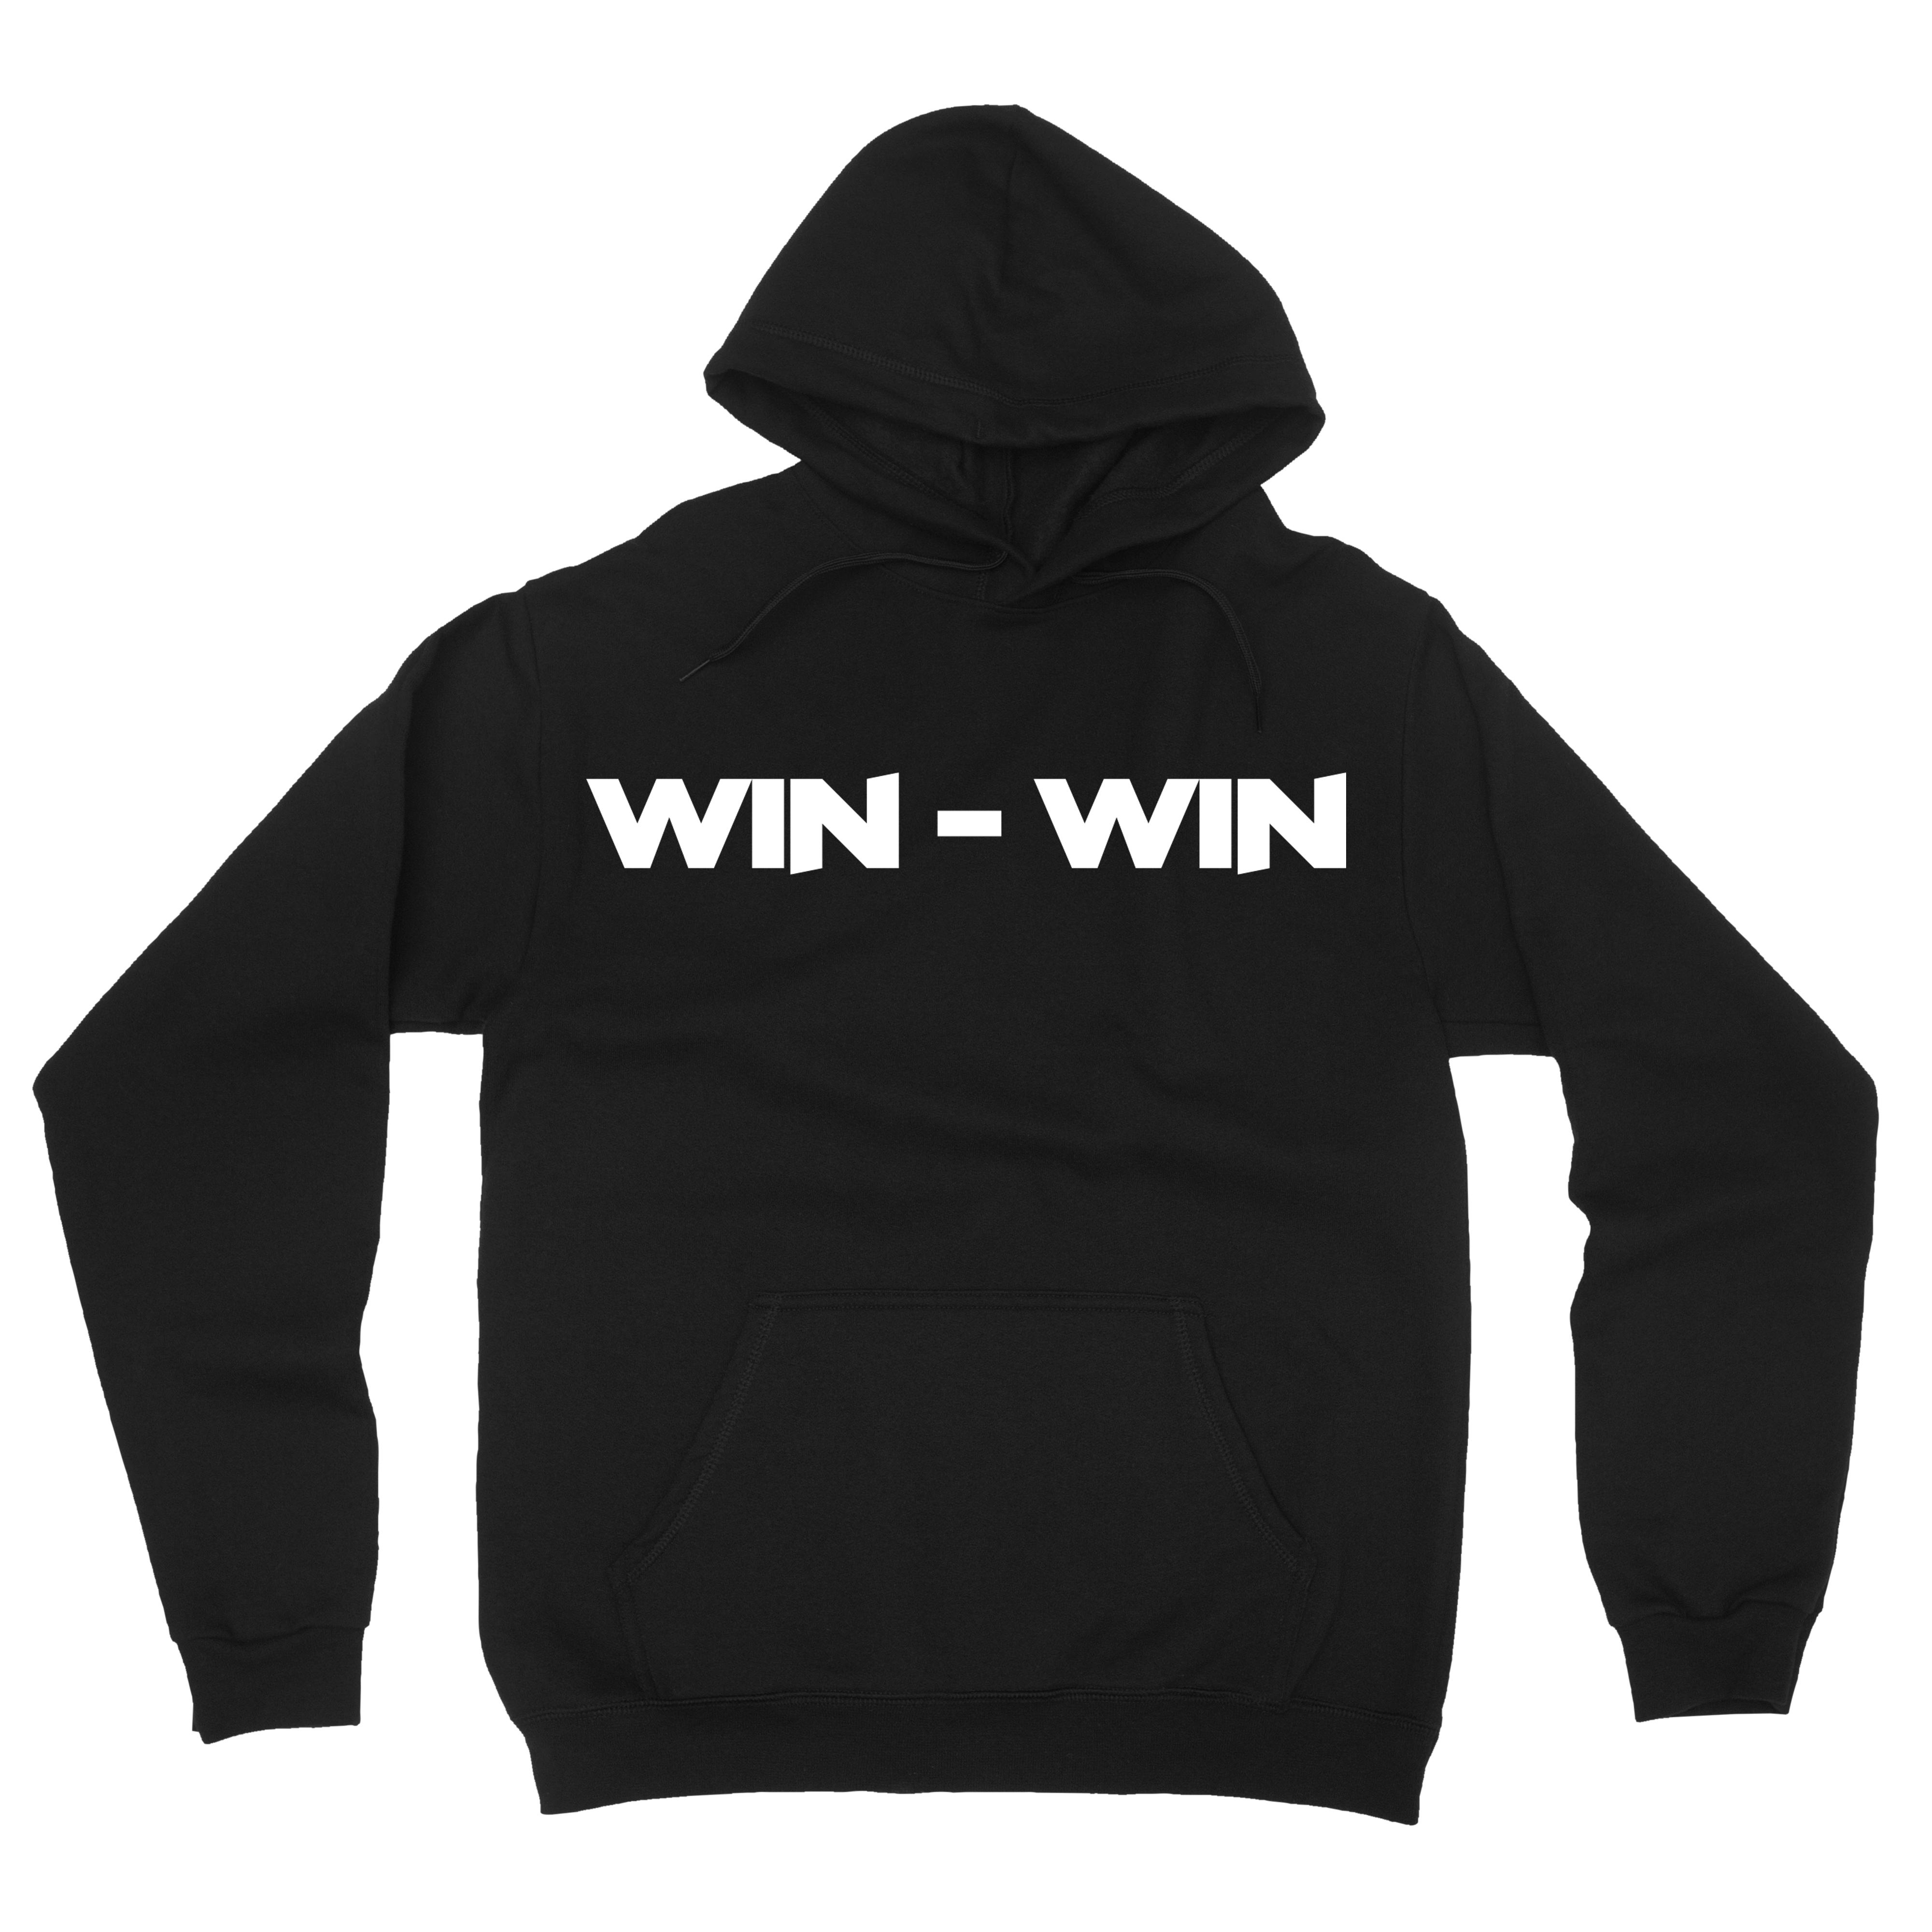 1winwin hoody black